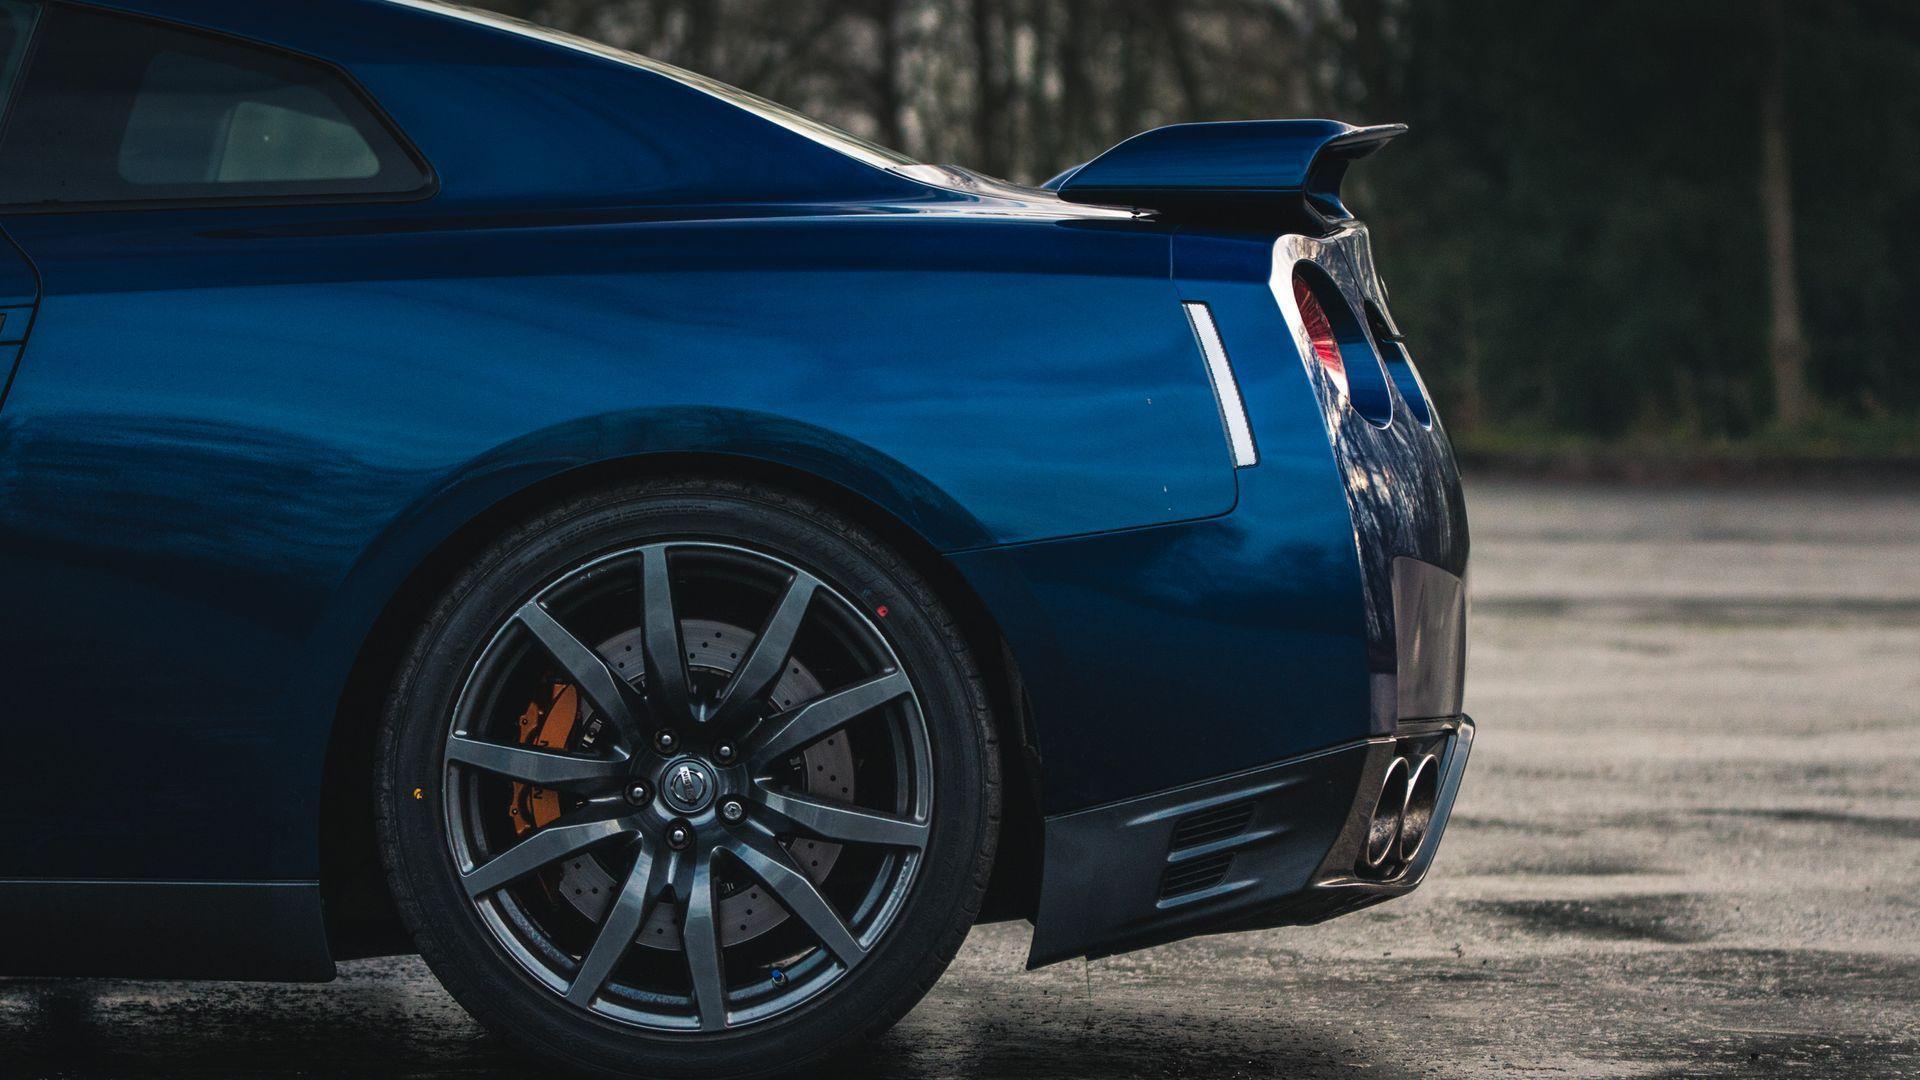 Nissan R34 Skyline GT-R Vs R35 GT-R: Downloadable Image Gallery Part 1